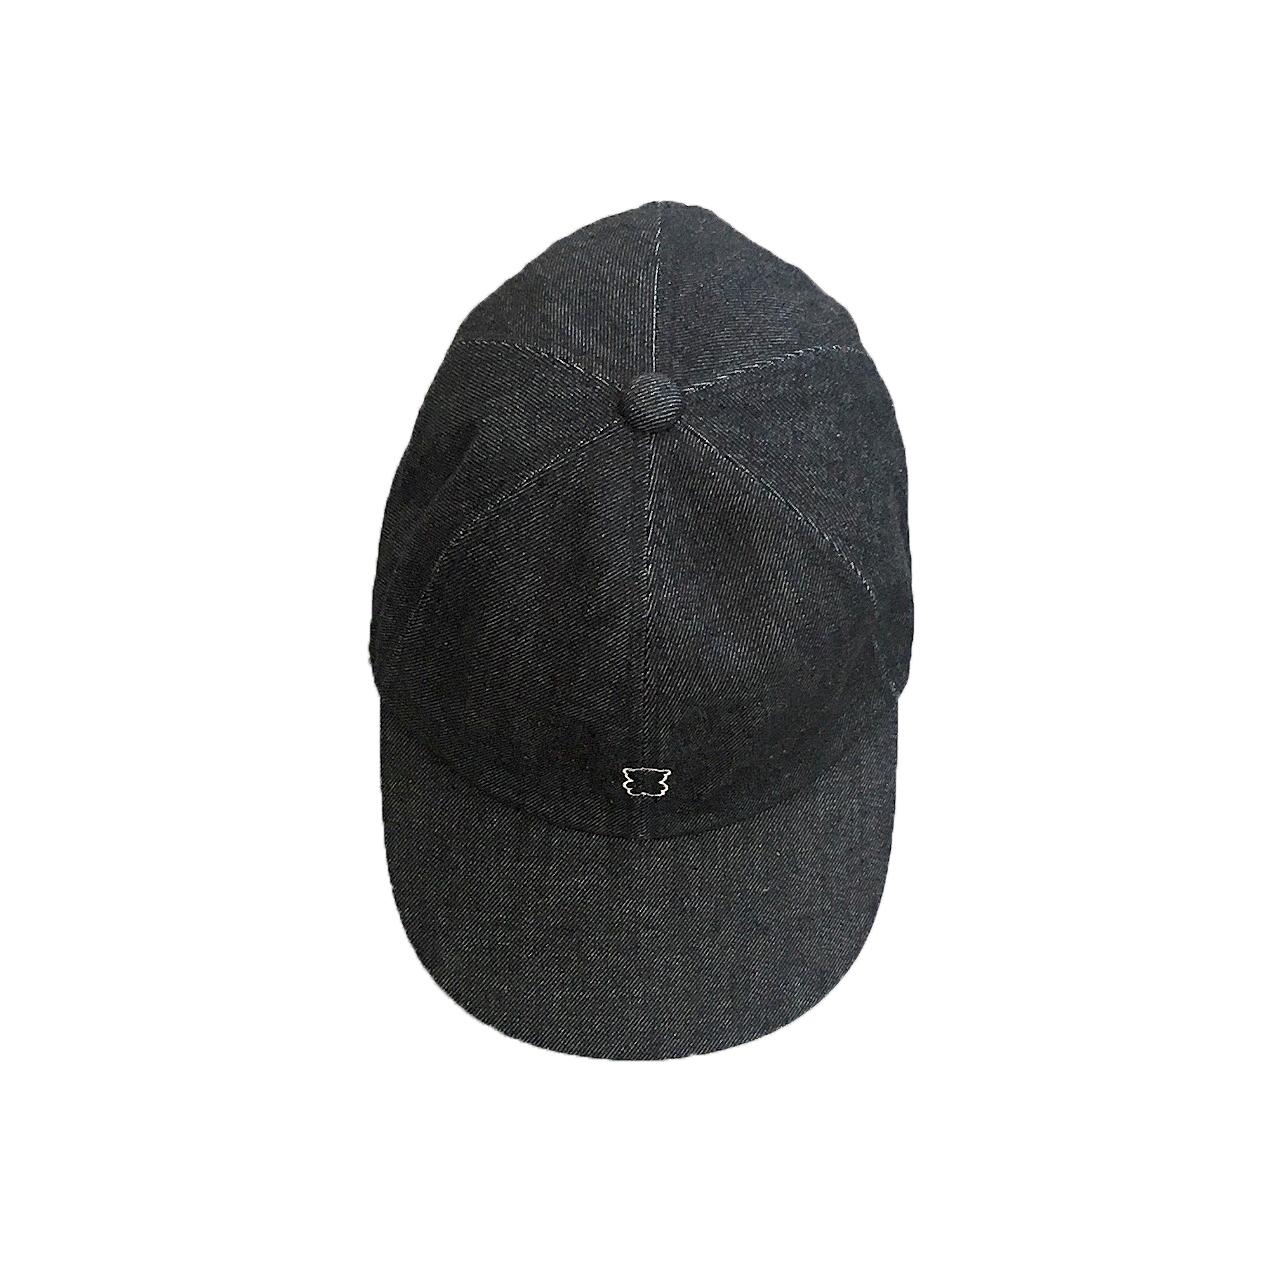 EMBROIDERY BEAR DENIM CAP / 1 2